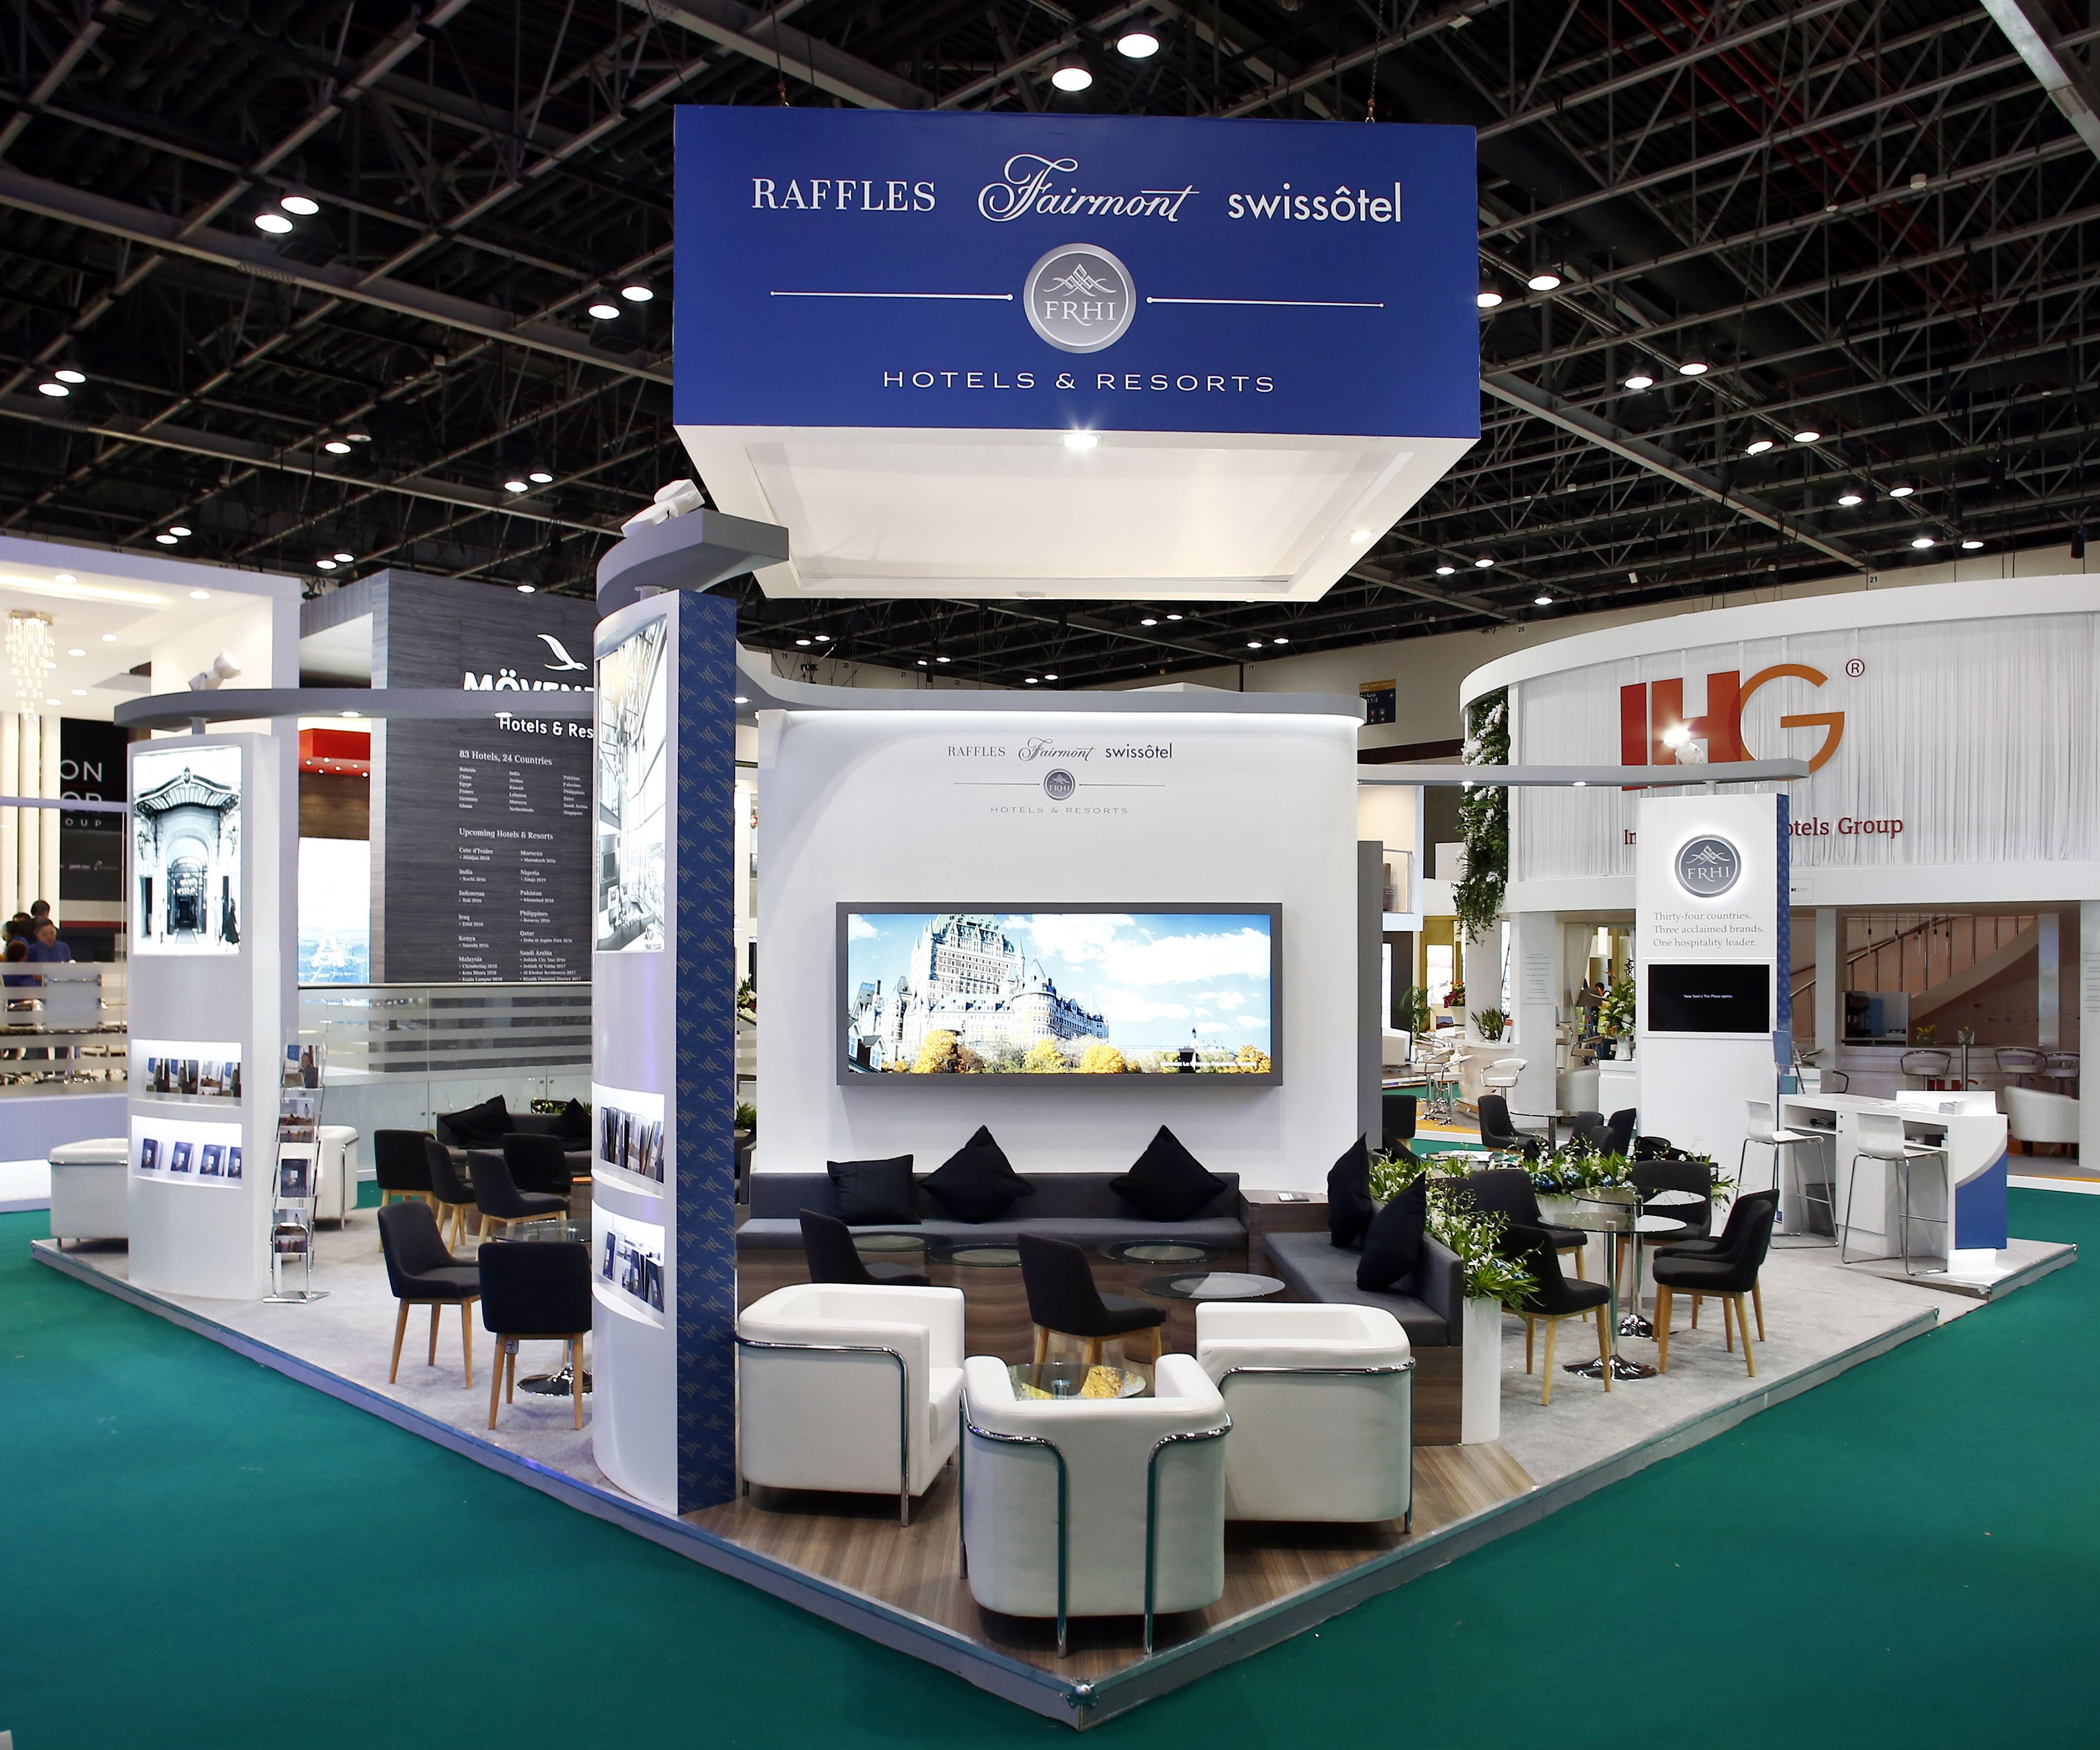 Exhibition Stand Design Kenya : Raffles fairmont & swissôtel exhibition stand design by elevations